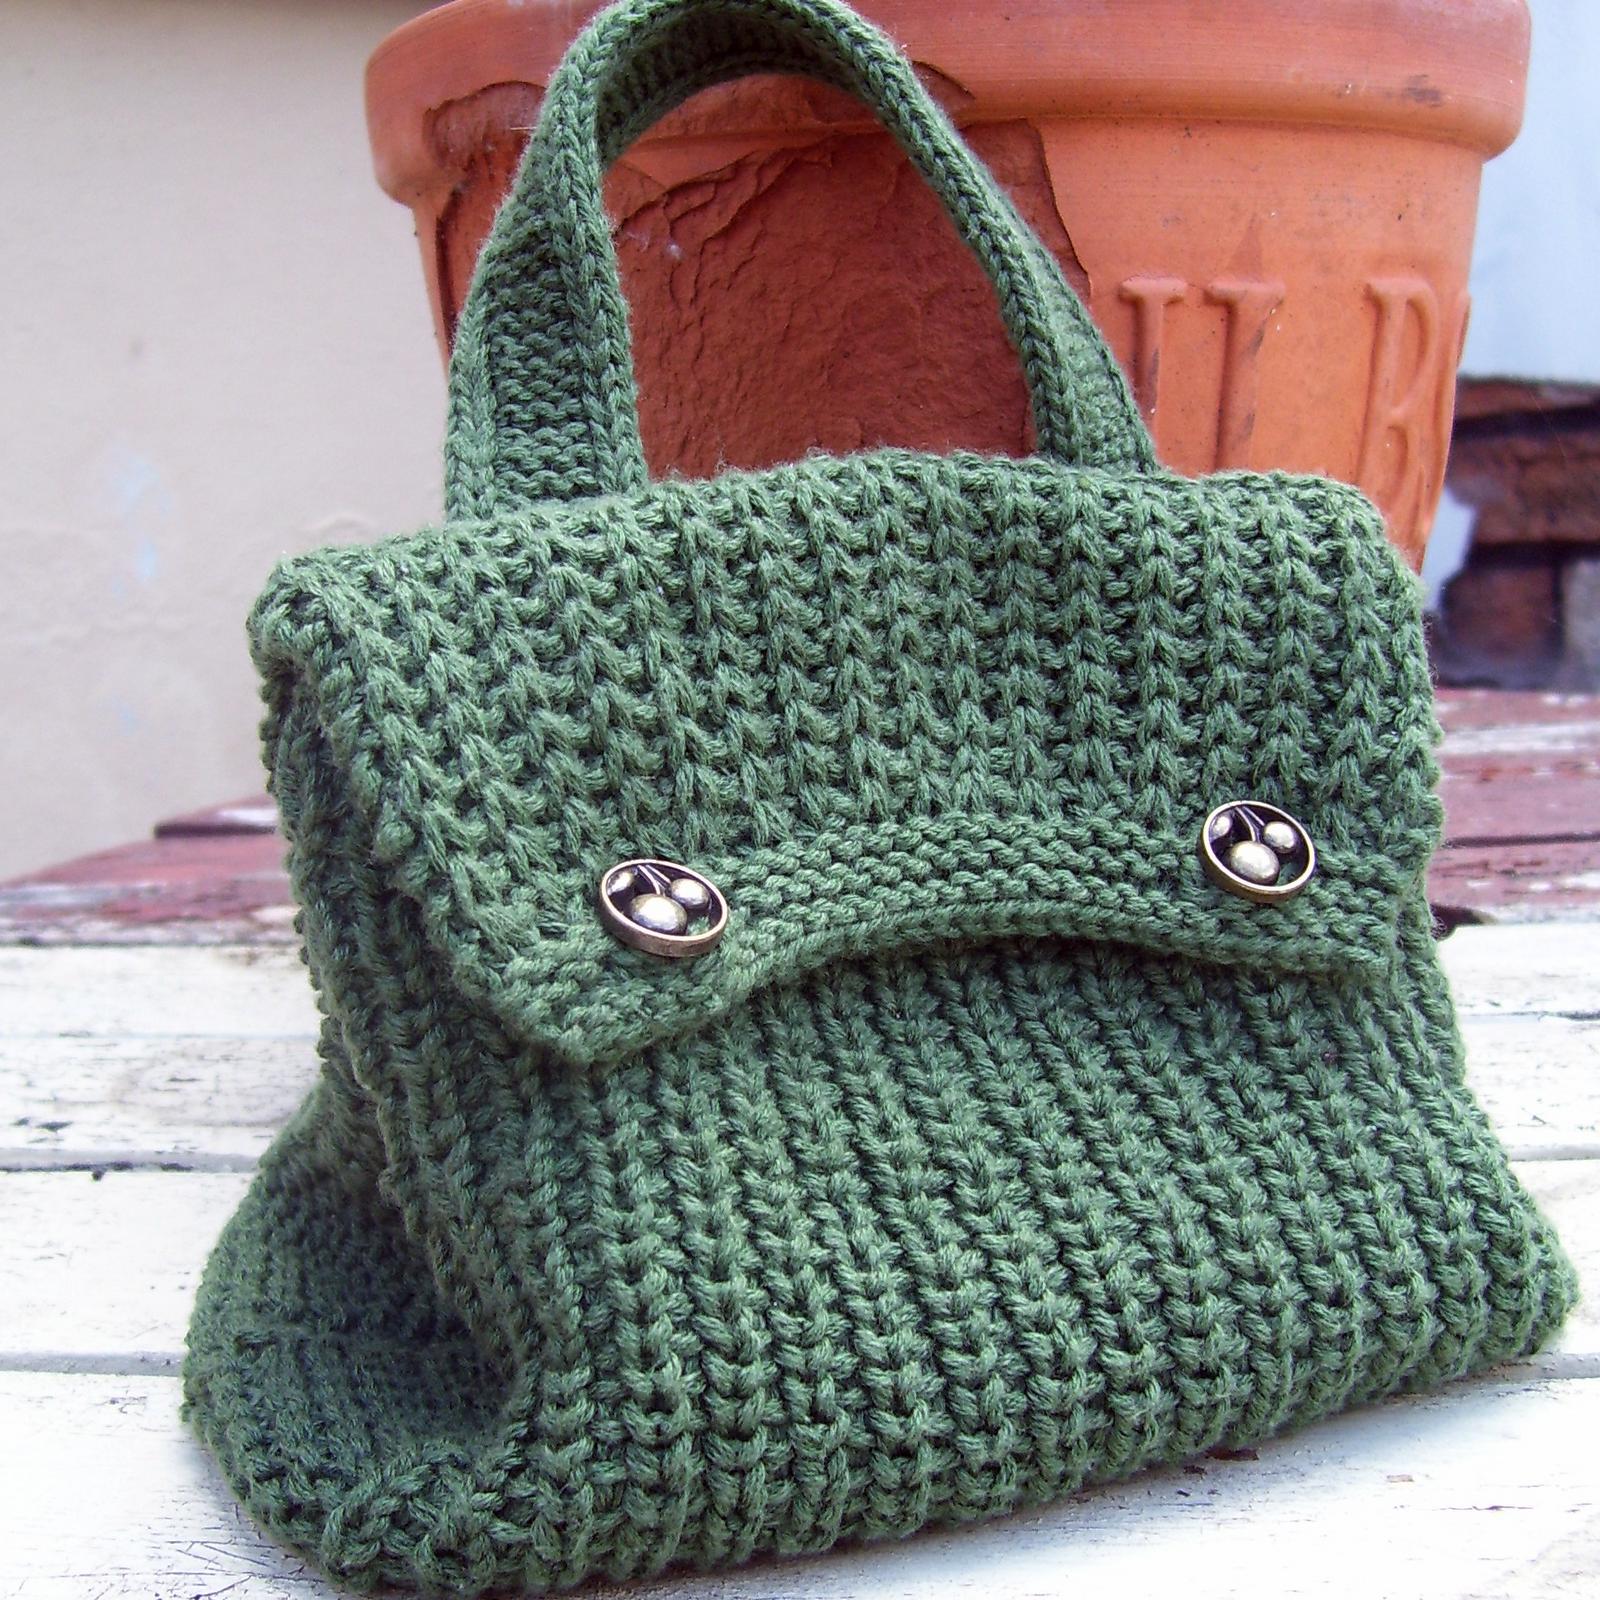 Sac D'emballage - Crochet Pinke 2 Par Vida Vida rEMa1rya